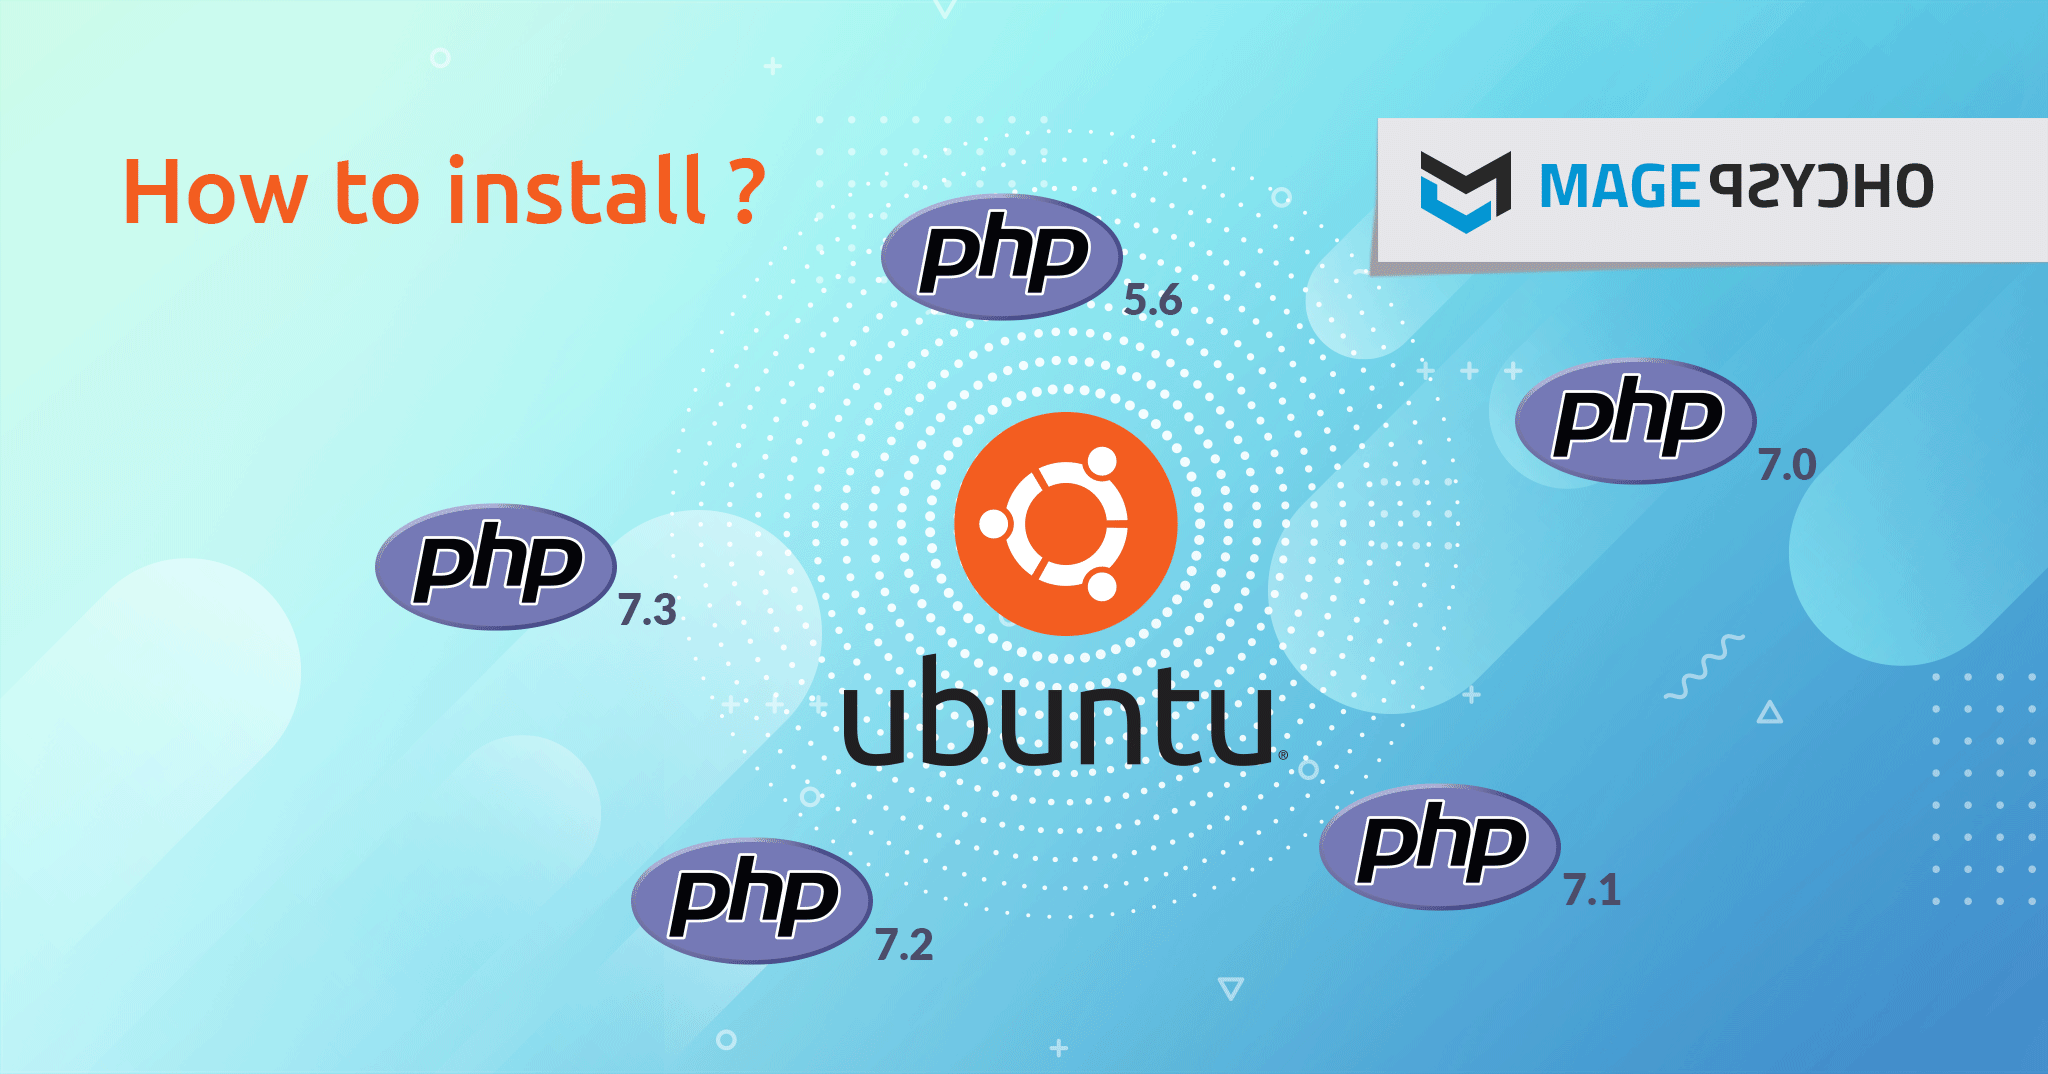 Install-Multiple-Versions-of-PHP-on-Ubuntu